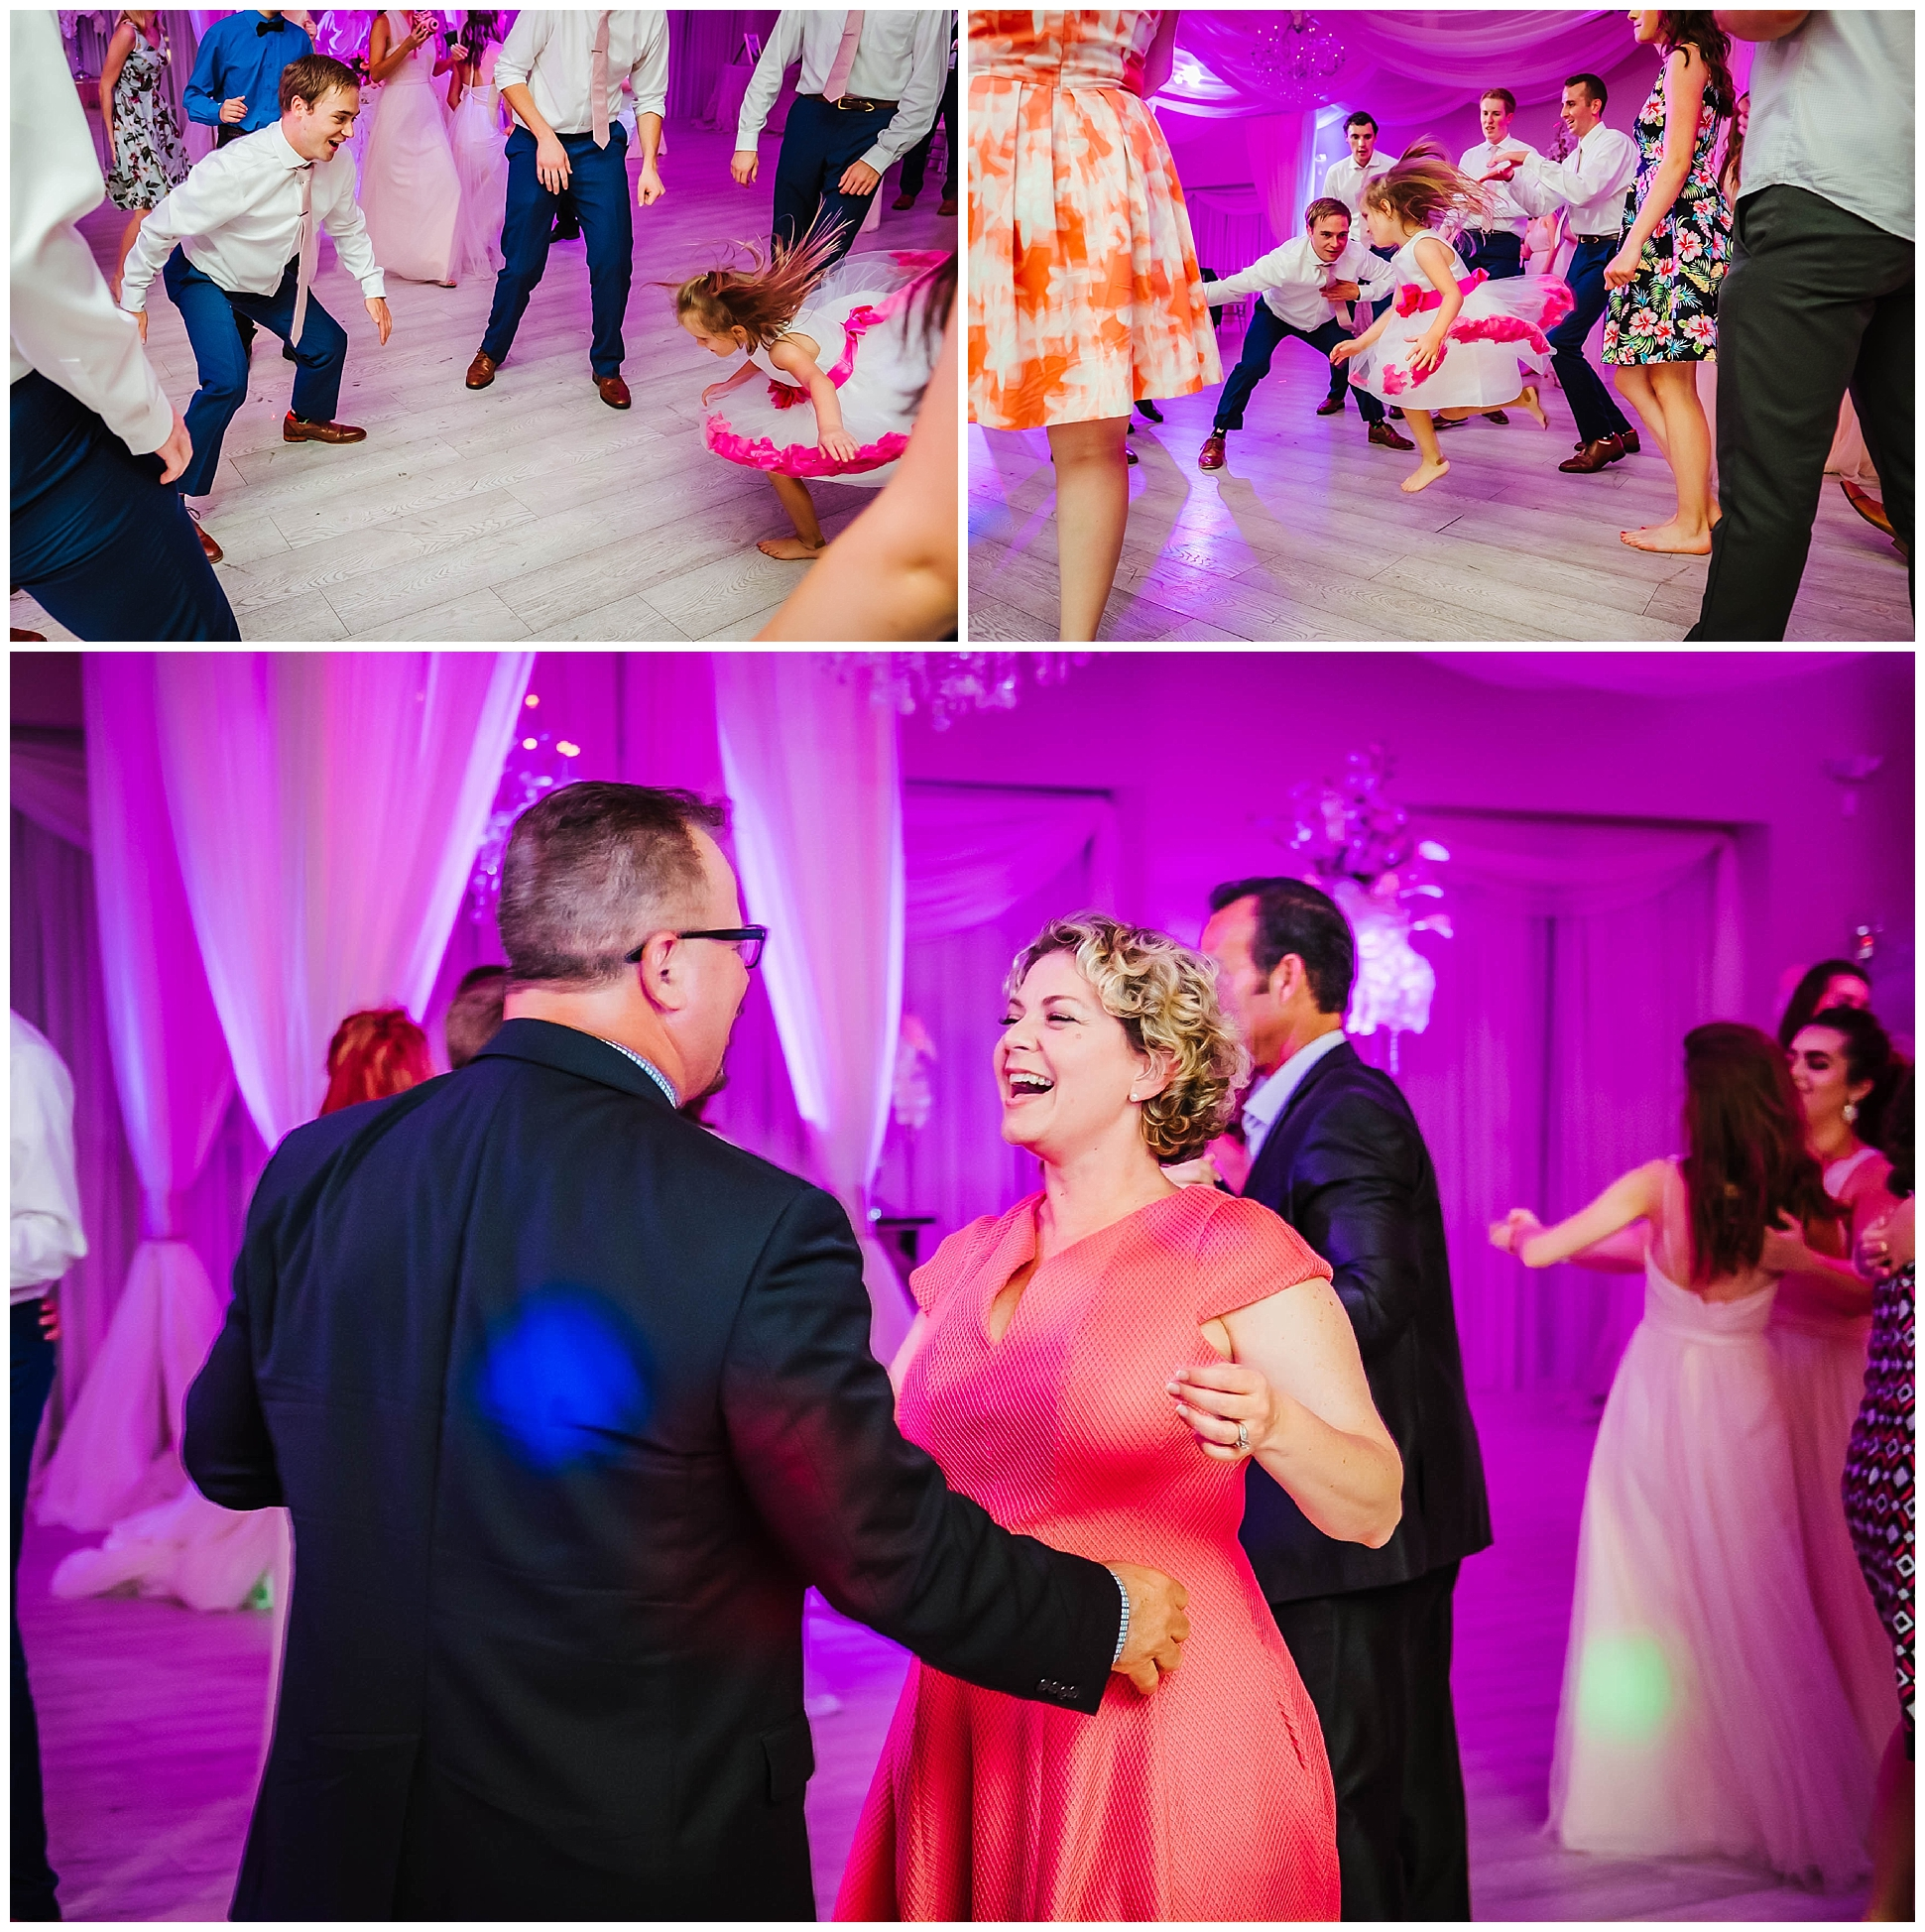 st-pete-wedding-photographer-sunken-gardens-crystal-ballroom-princess-dancer_0210.jpg